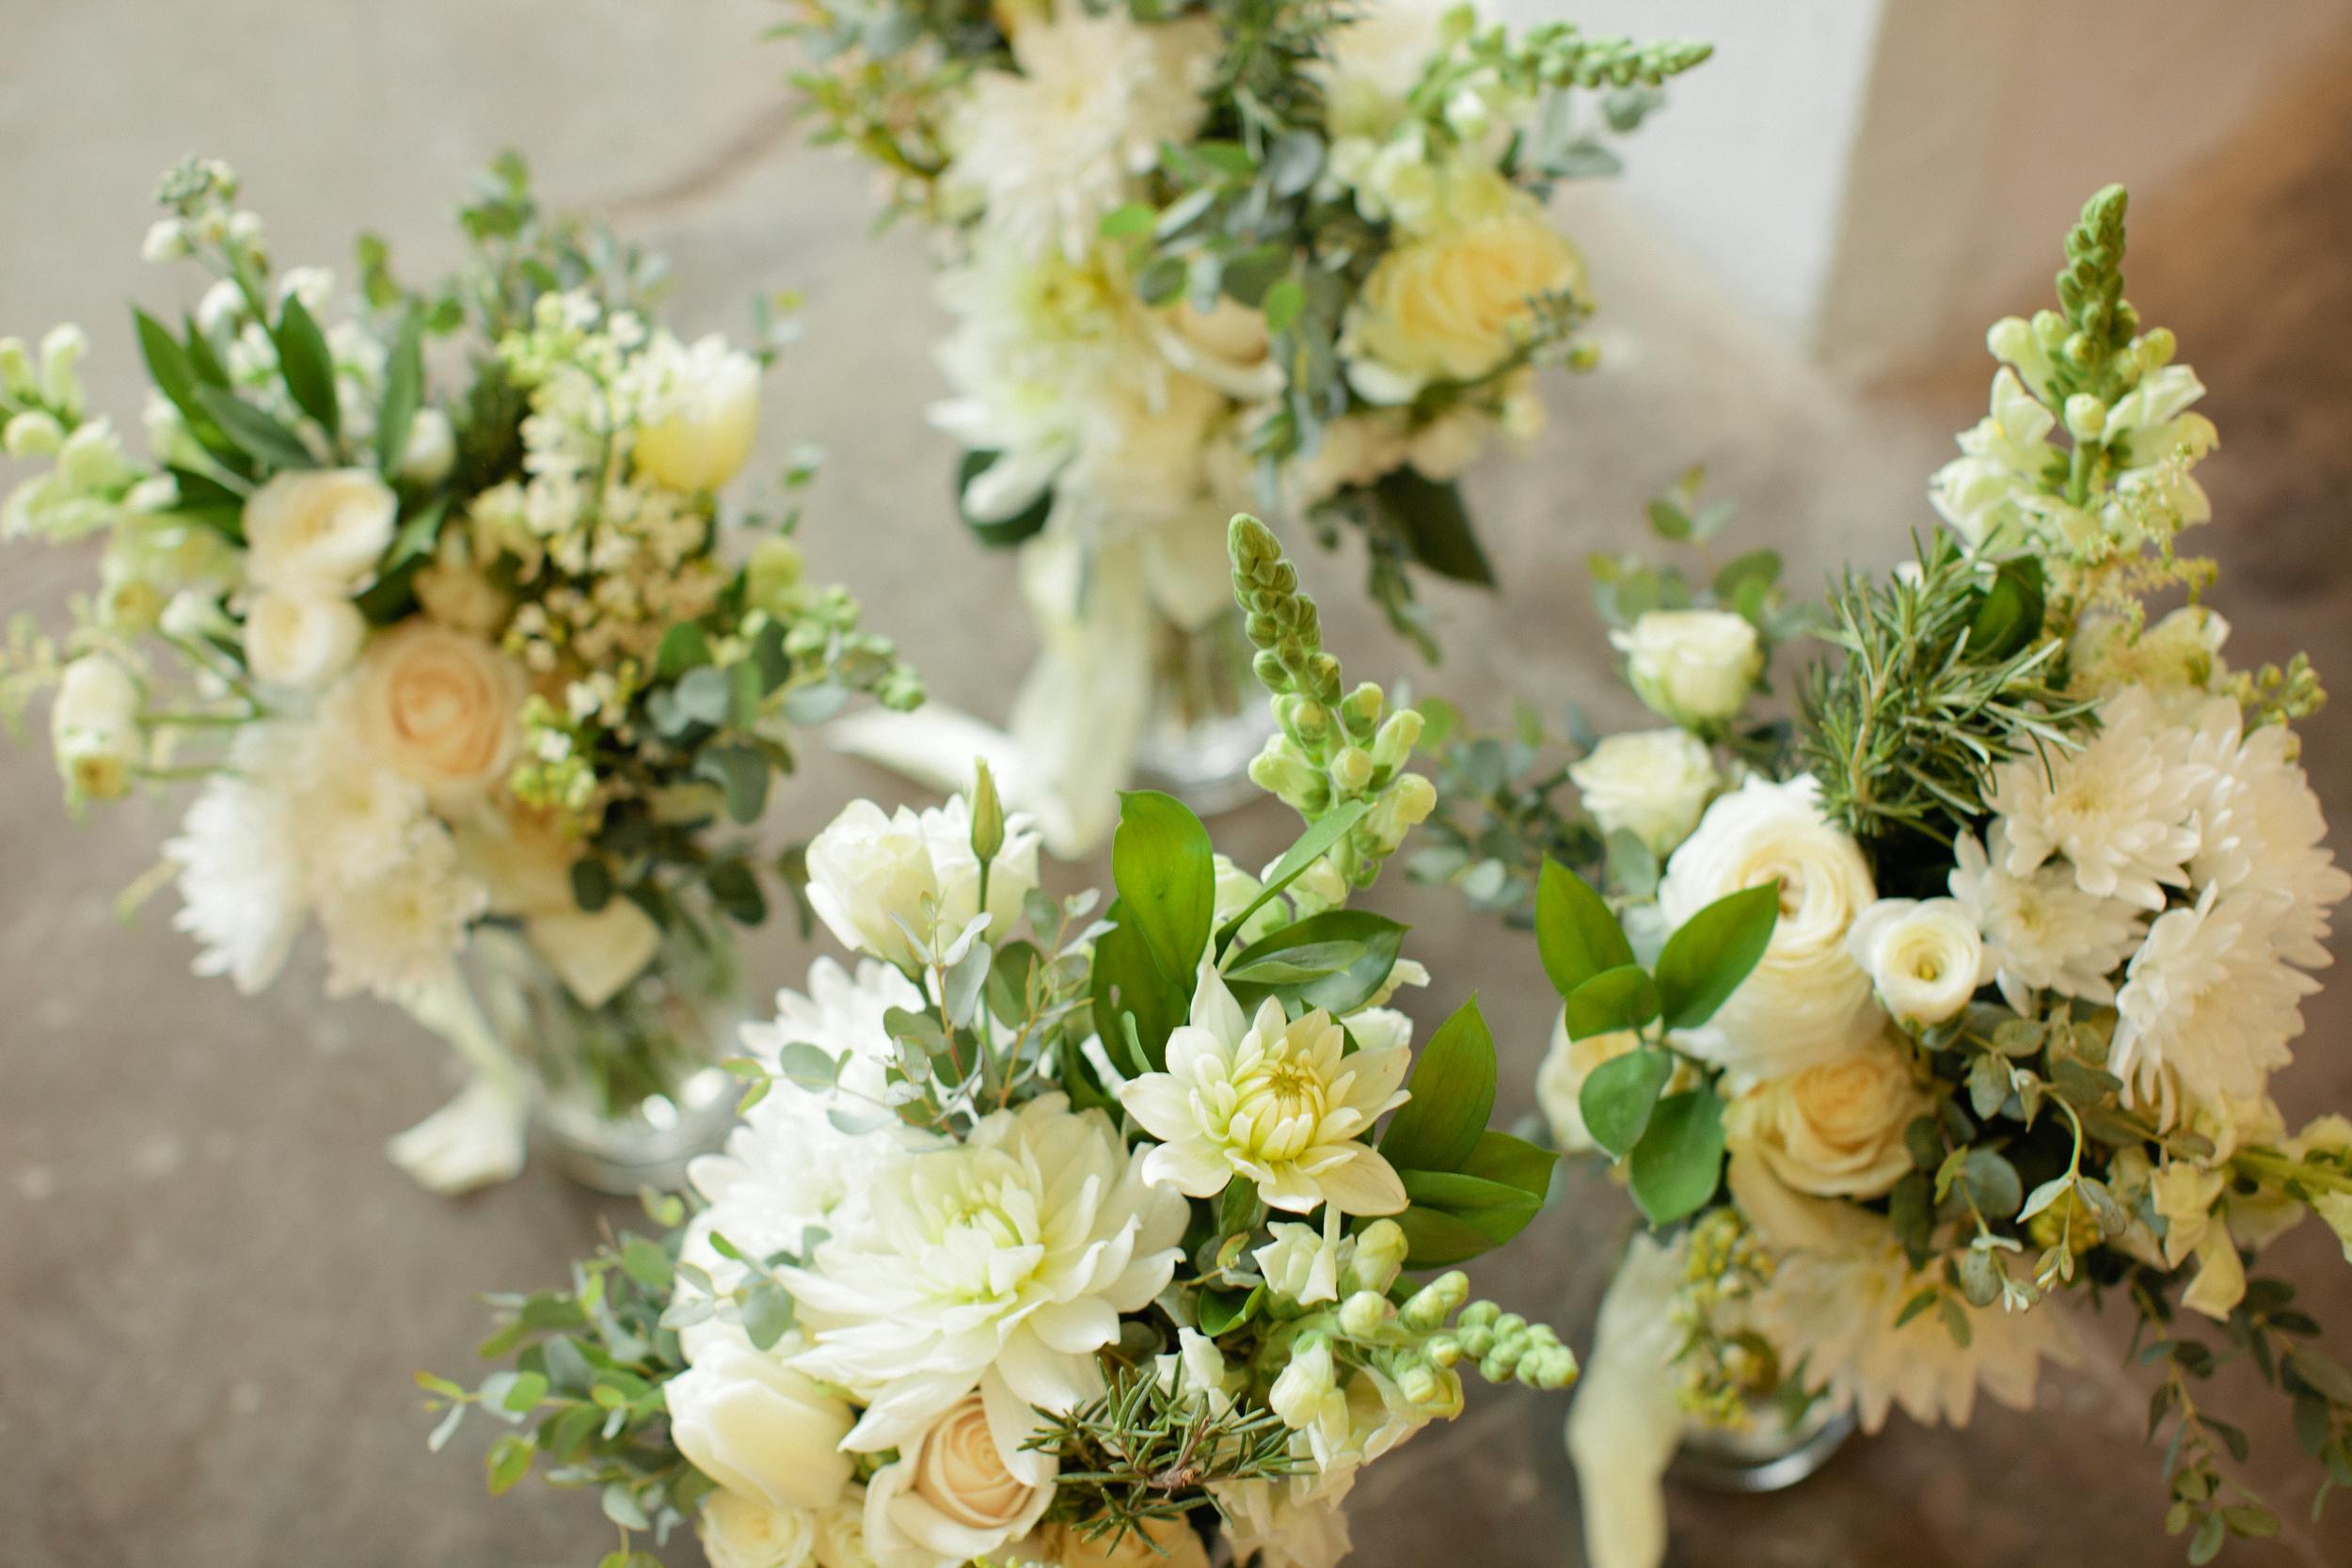 White bridesmaids bouquets - eversomething.com